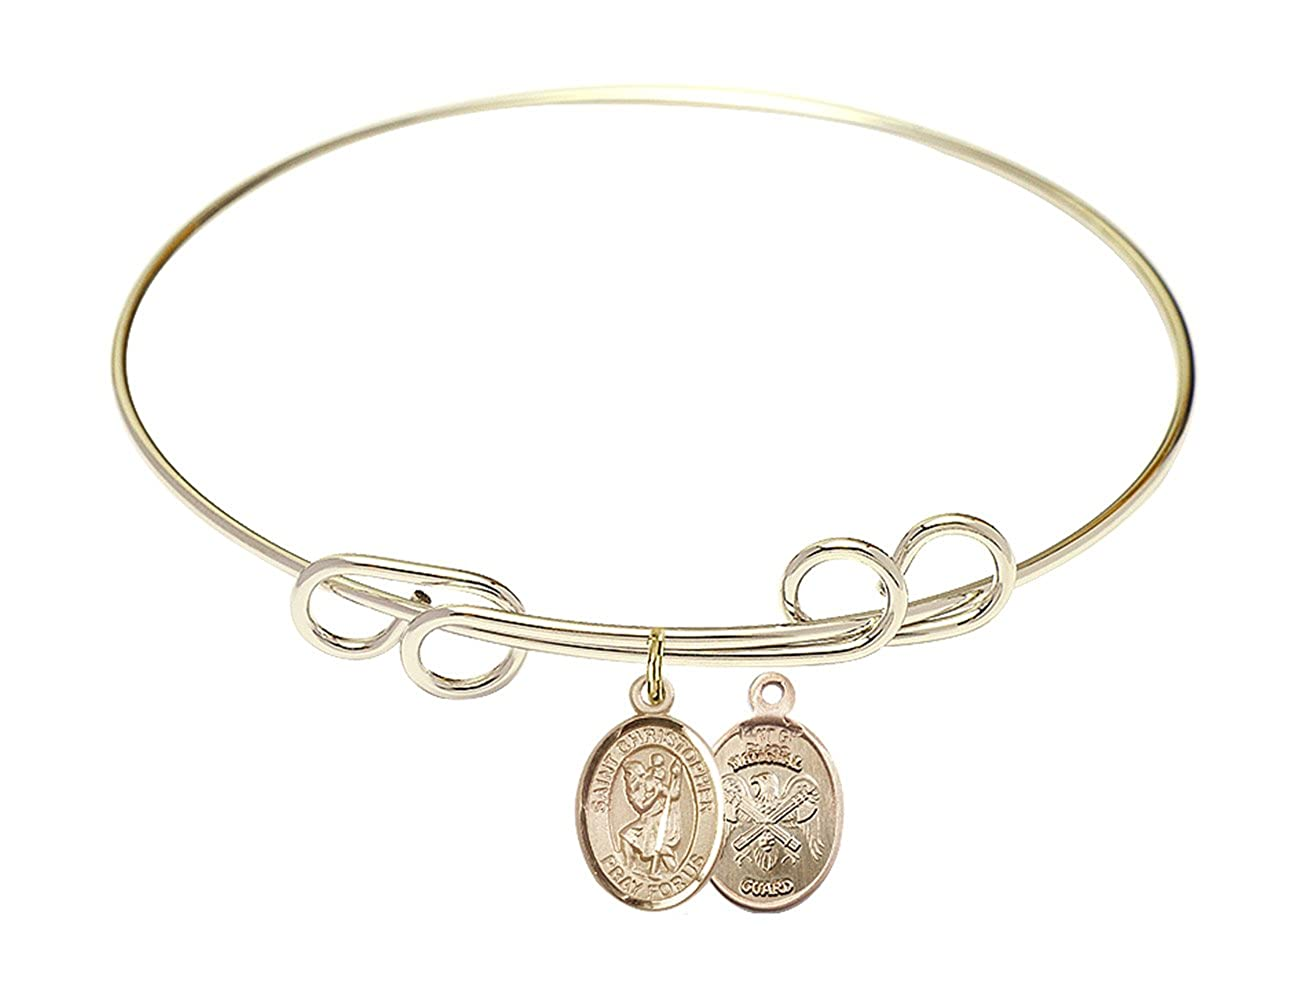 Christopher//Natl Guard Charm. DiamondJewelryNY Double Loop Bangle Bracelet with a St